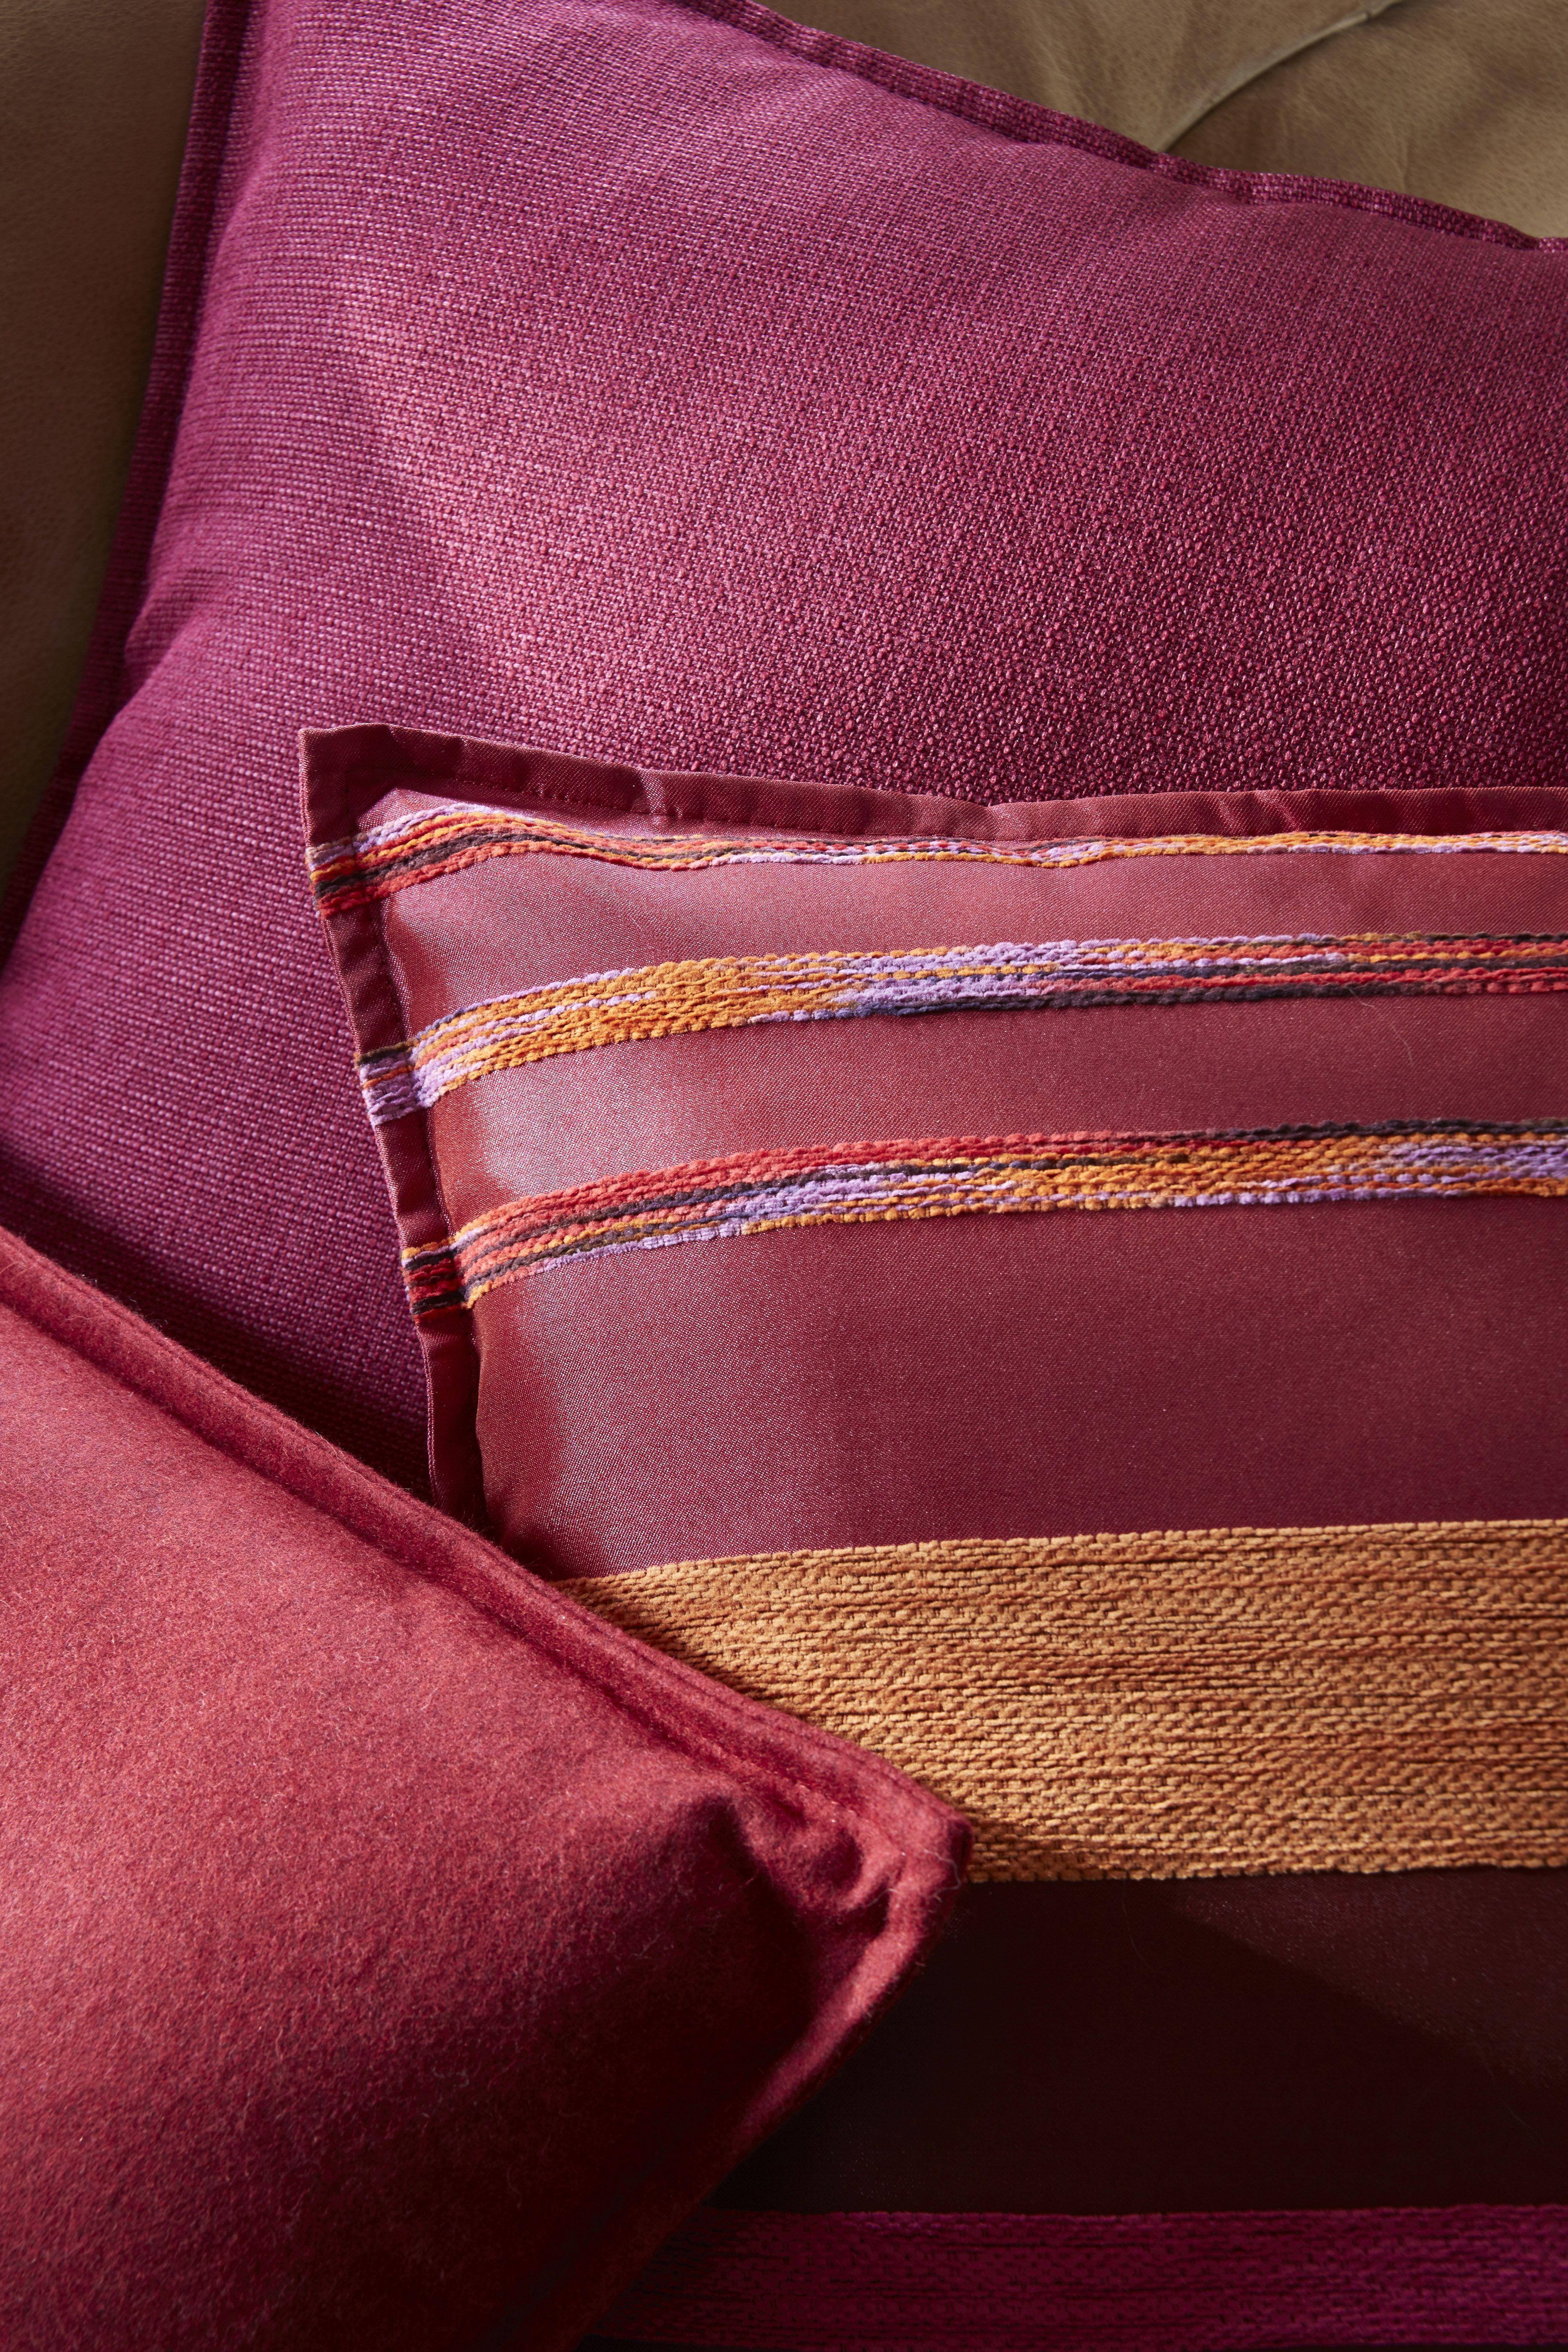 focus coussins en tissus flanelle framboise napoli fuchsia et quatro fuchsia collection heytens. Black Bedroom Furniture Sets. Home Design Ideas